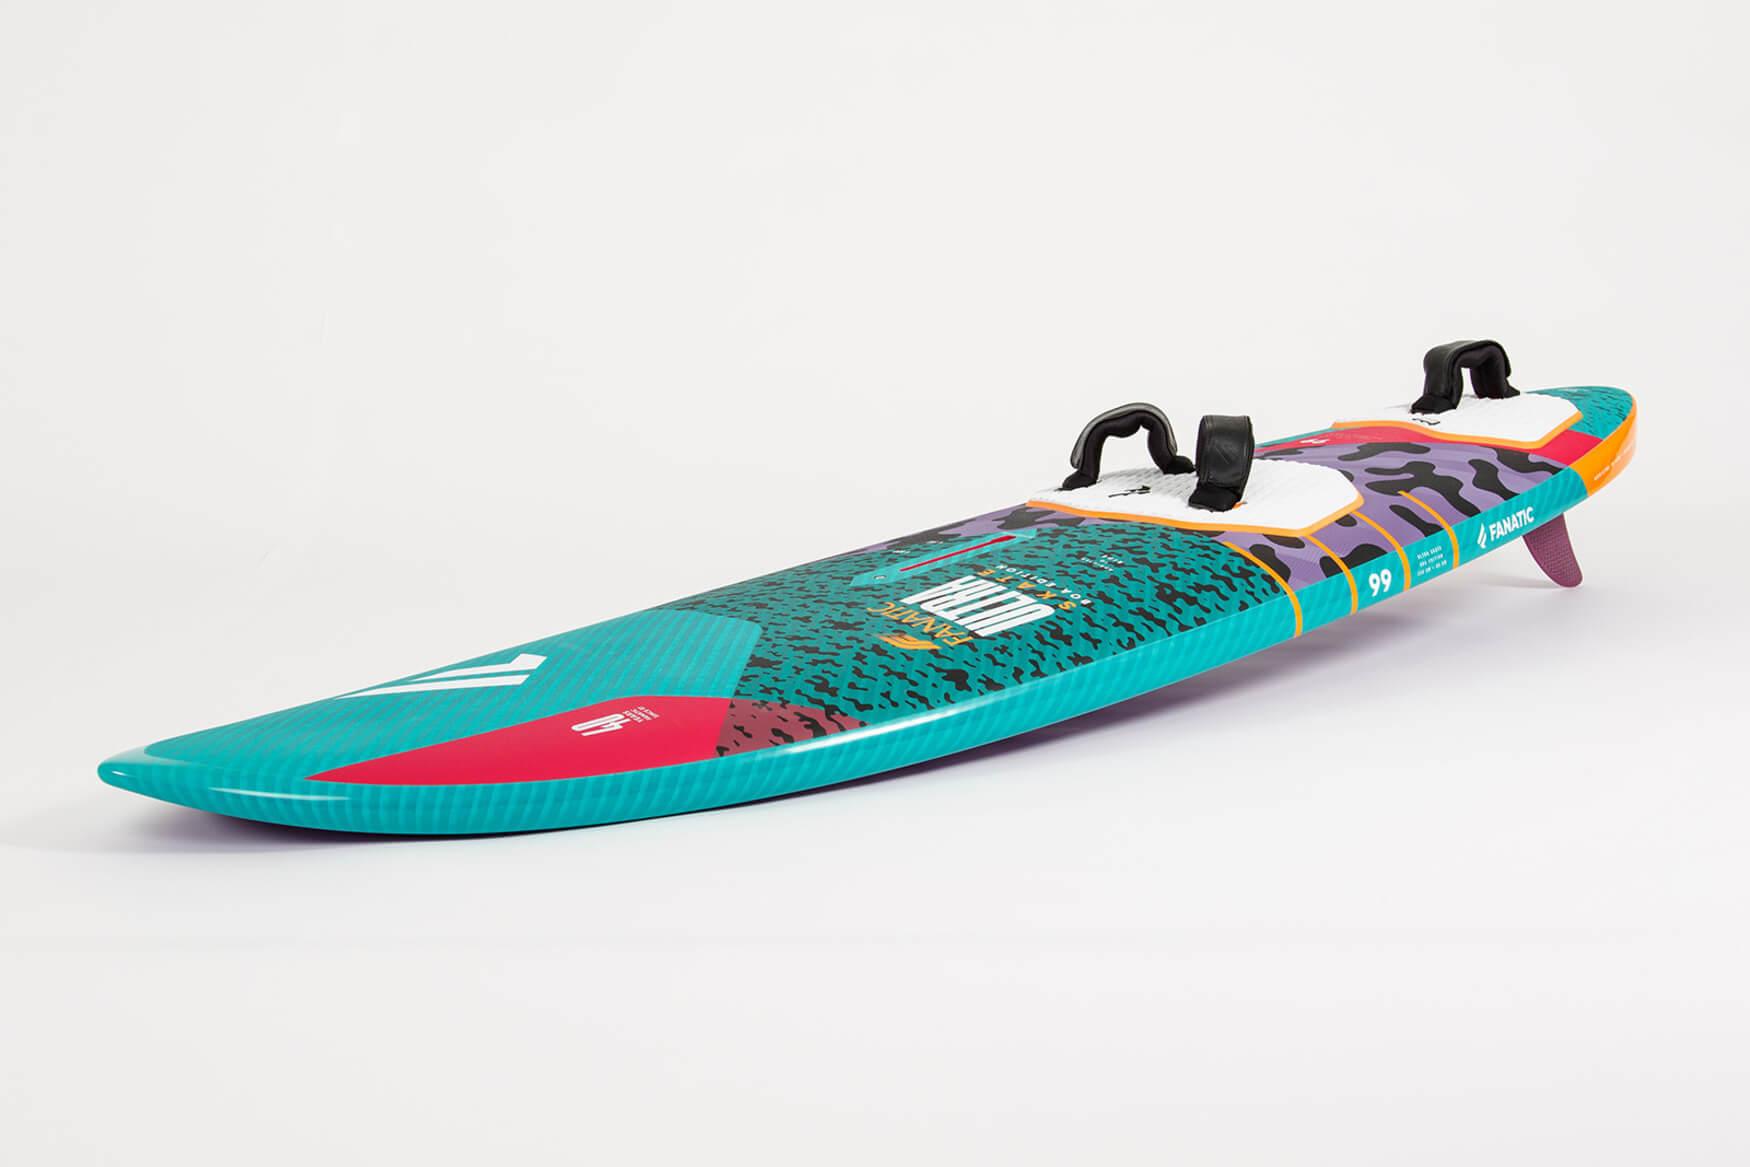 Skate TE - Boa Edition